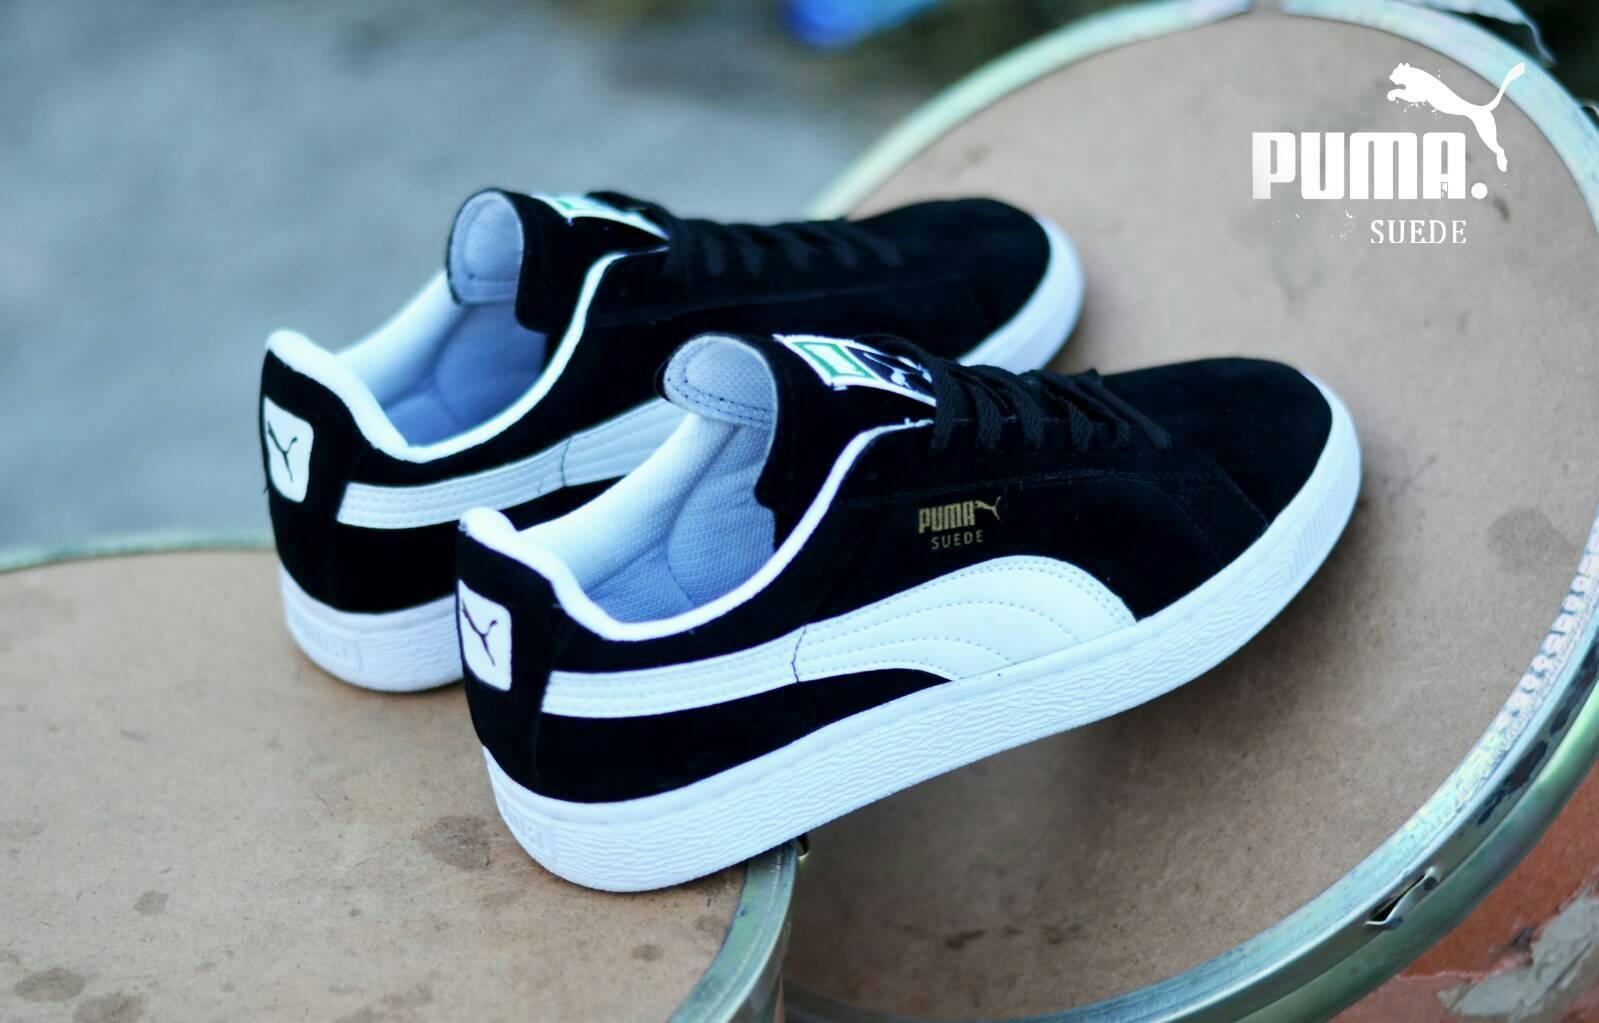 Fitur Sepatu Casual Murah Humm3r Hummer Fox Pria Original Ter Boots Underground Puma Suede Santai Sneakers